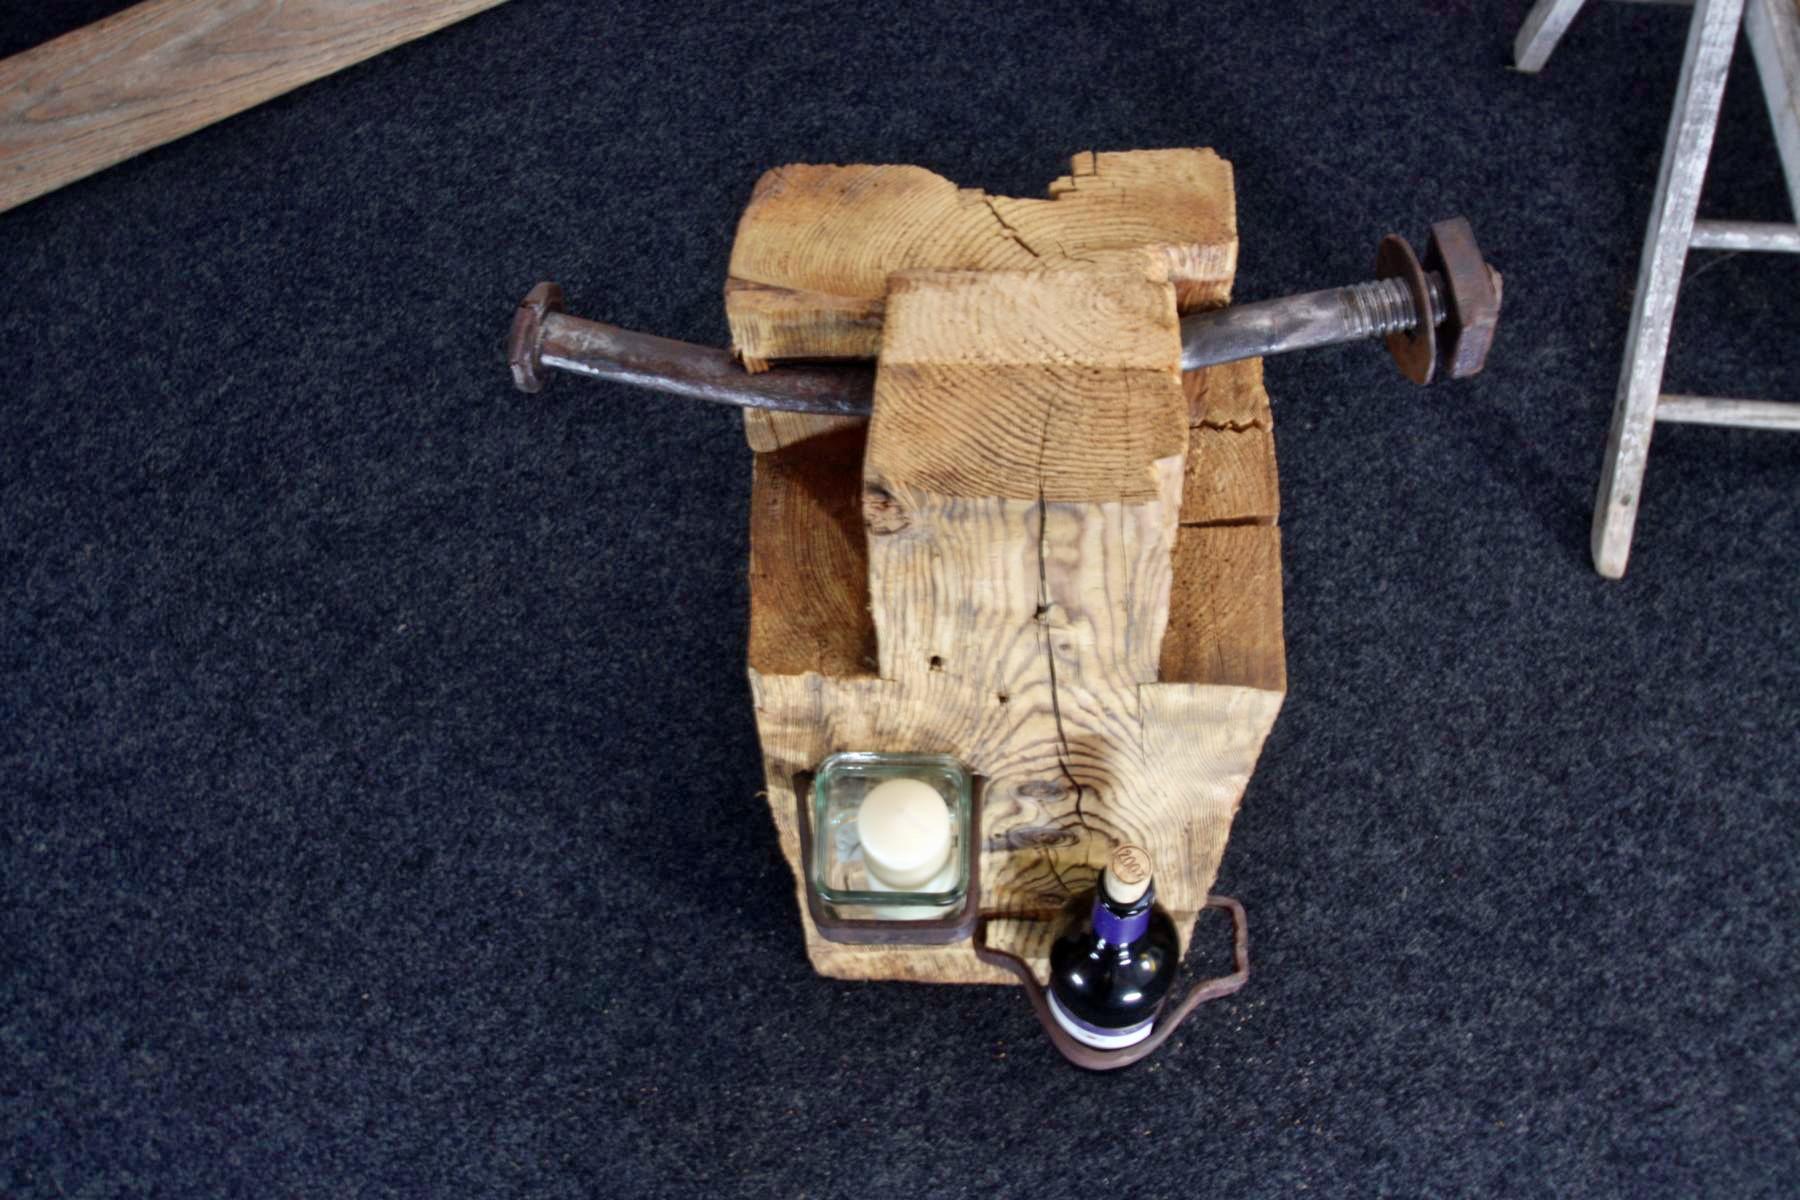 Altholz sparren balken   www.treibholz bodensee.de   altholz recycling